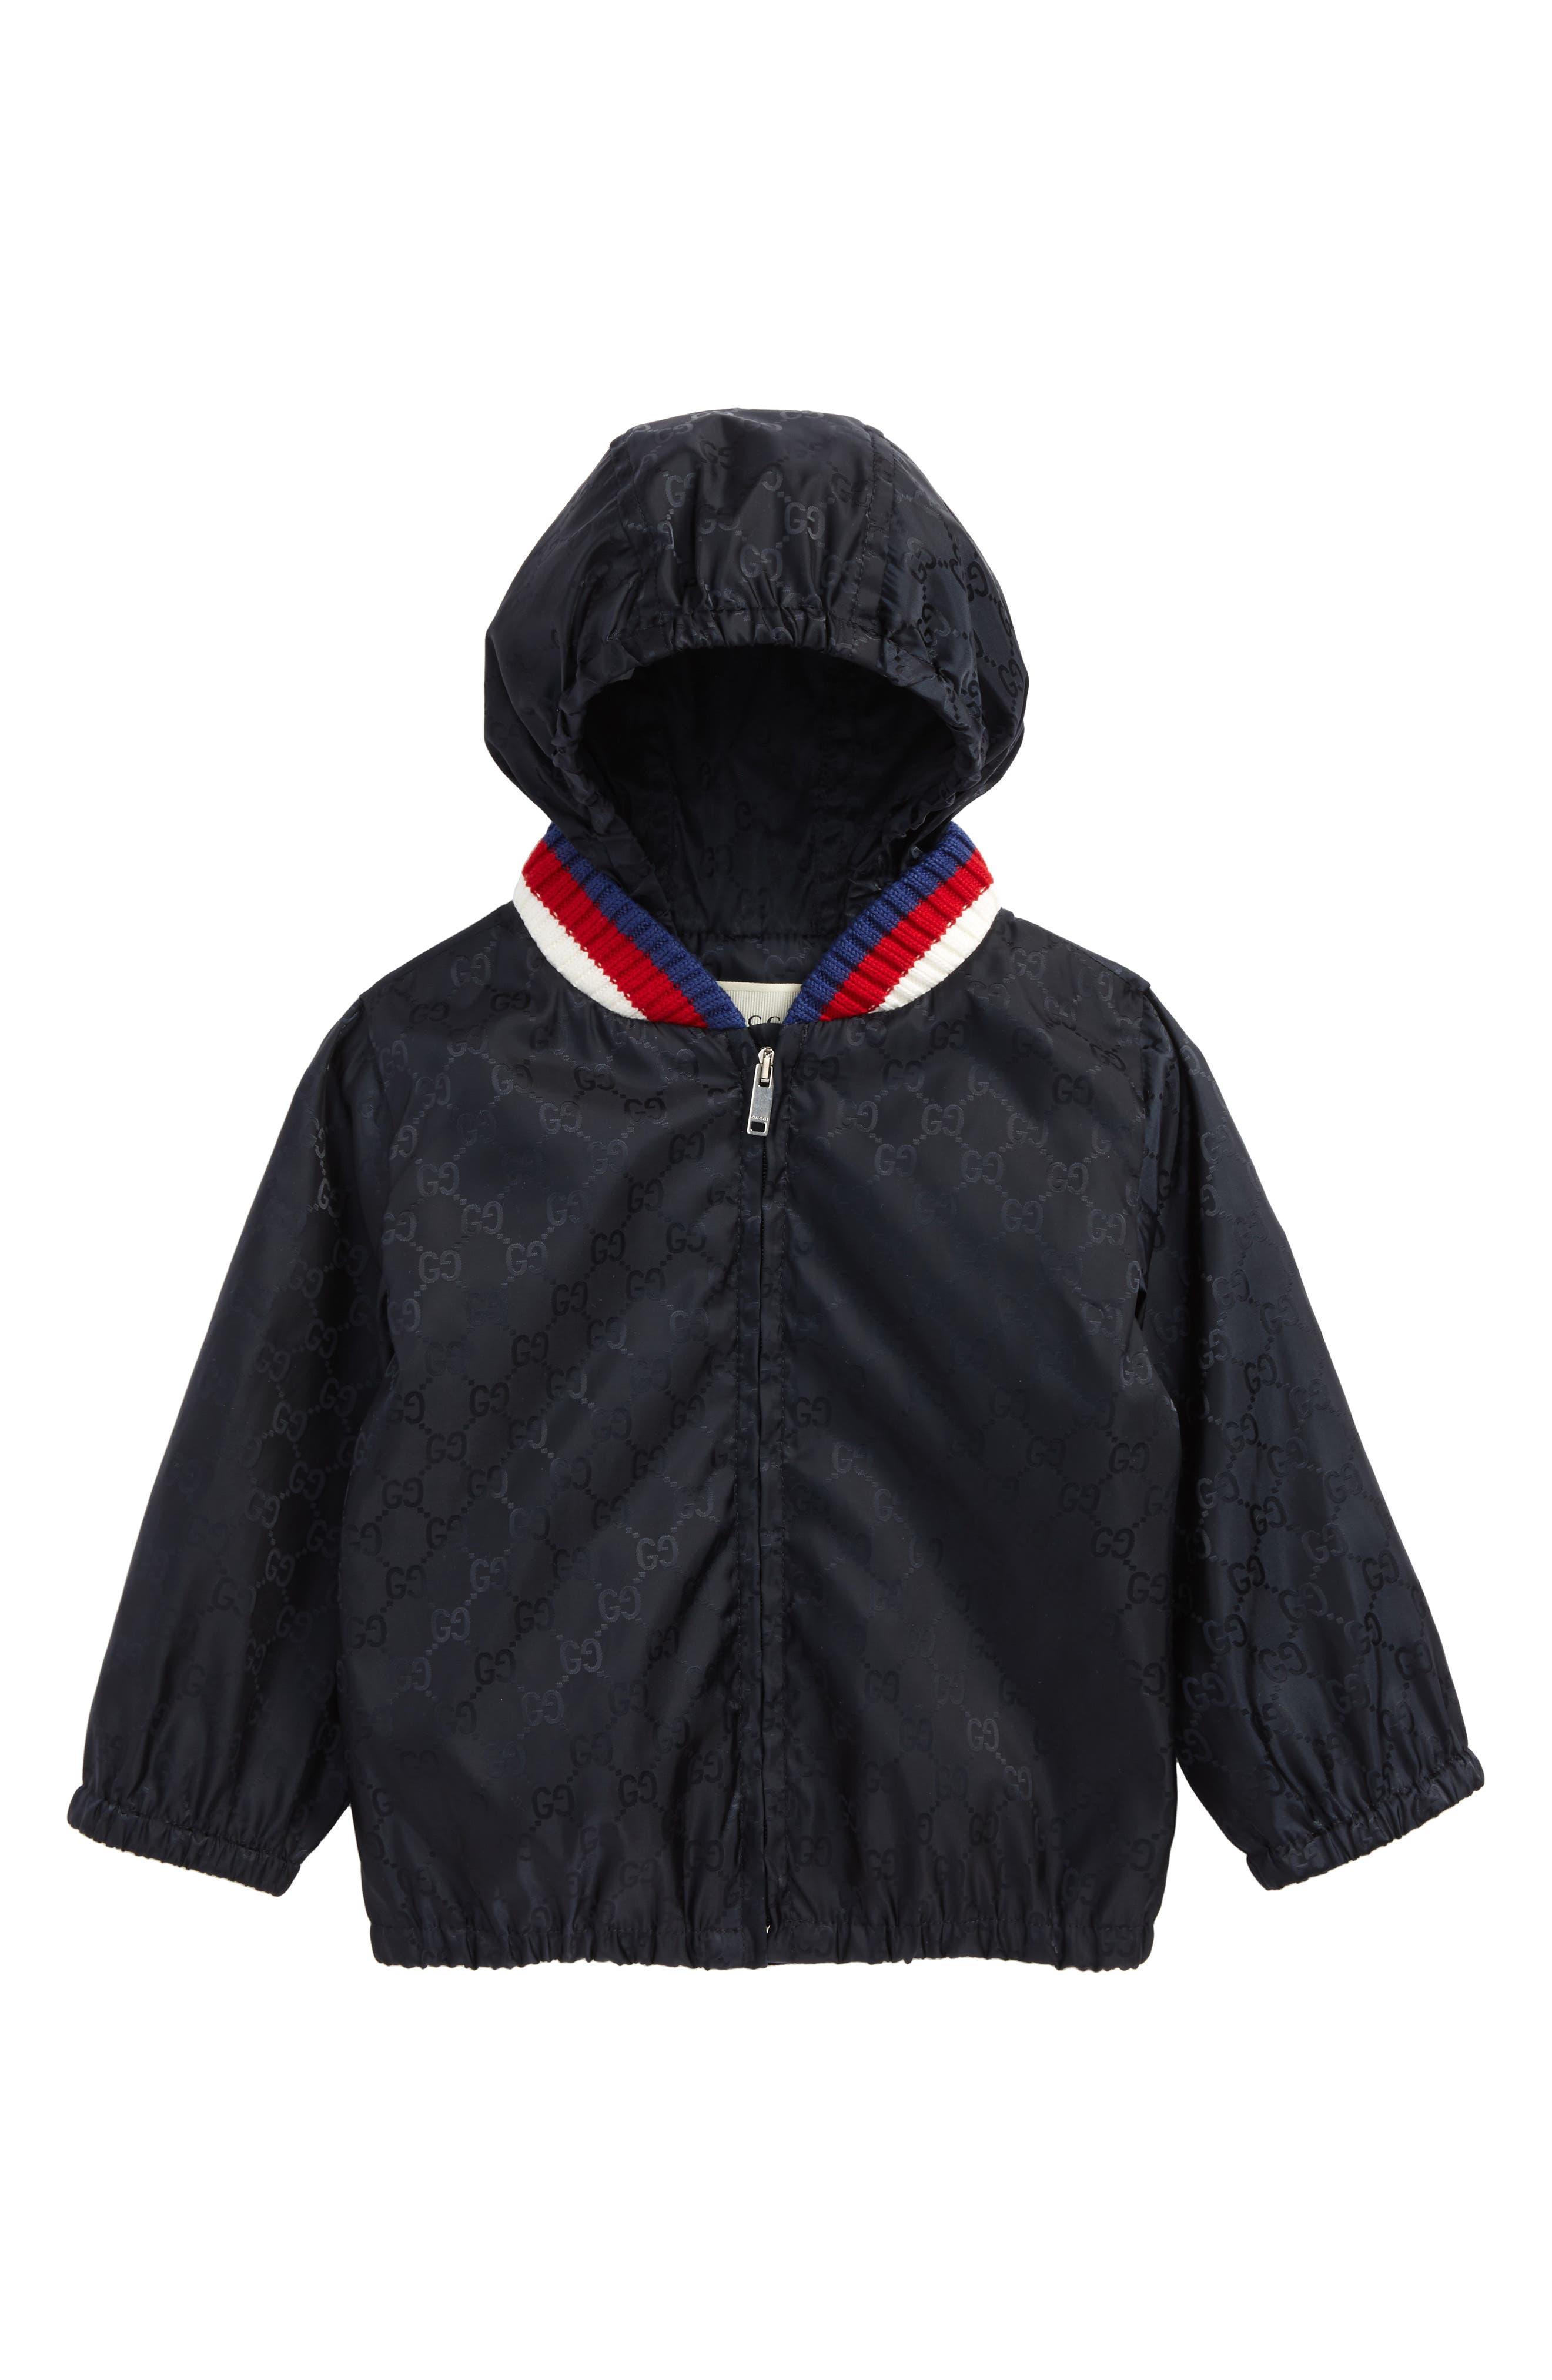 Gucci GG Logo Jacquard Hooded Rain Jacket (Baby)